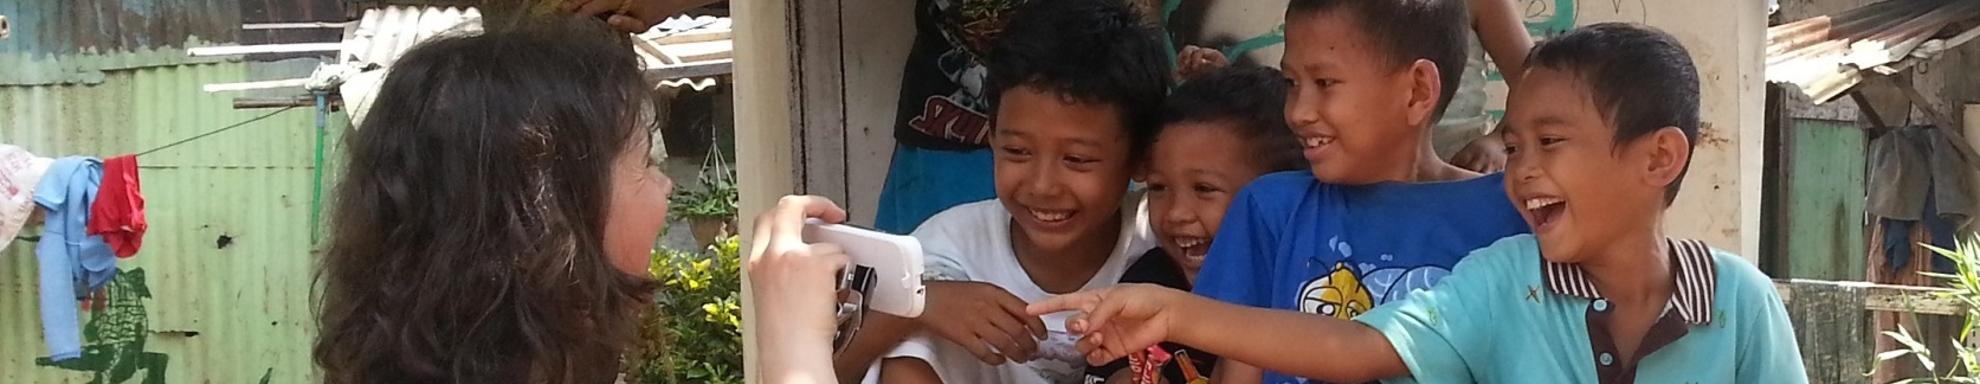 Philippines SASI study trip